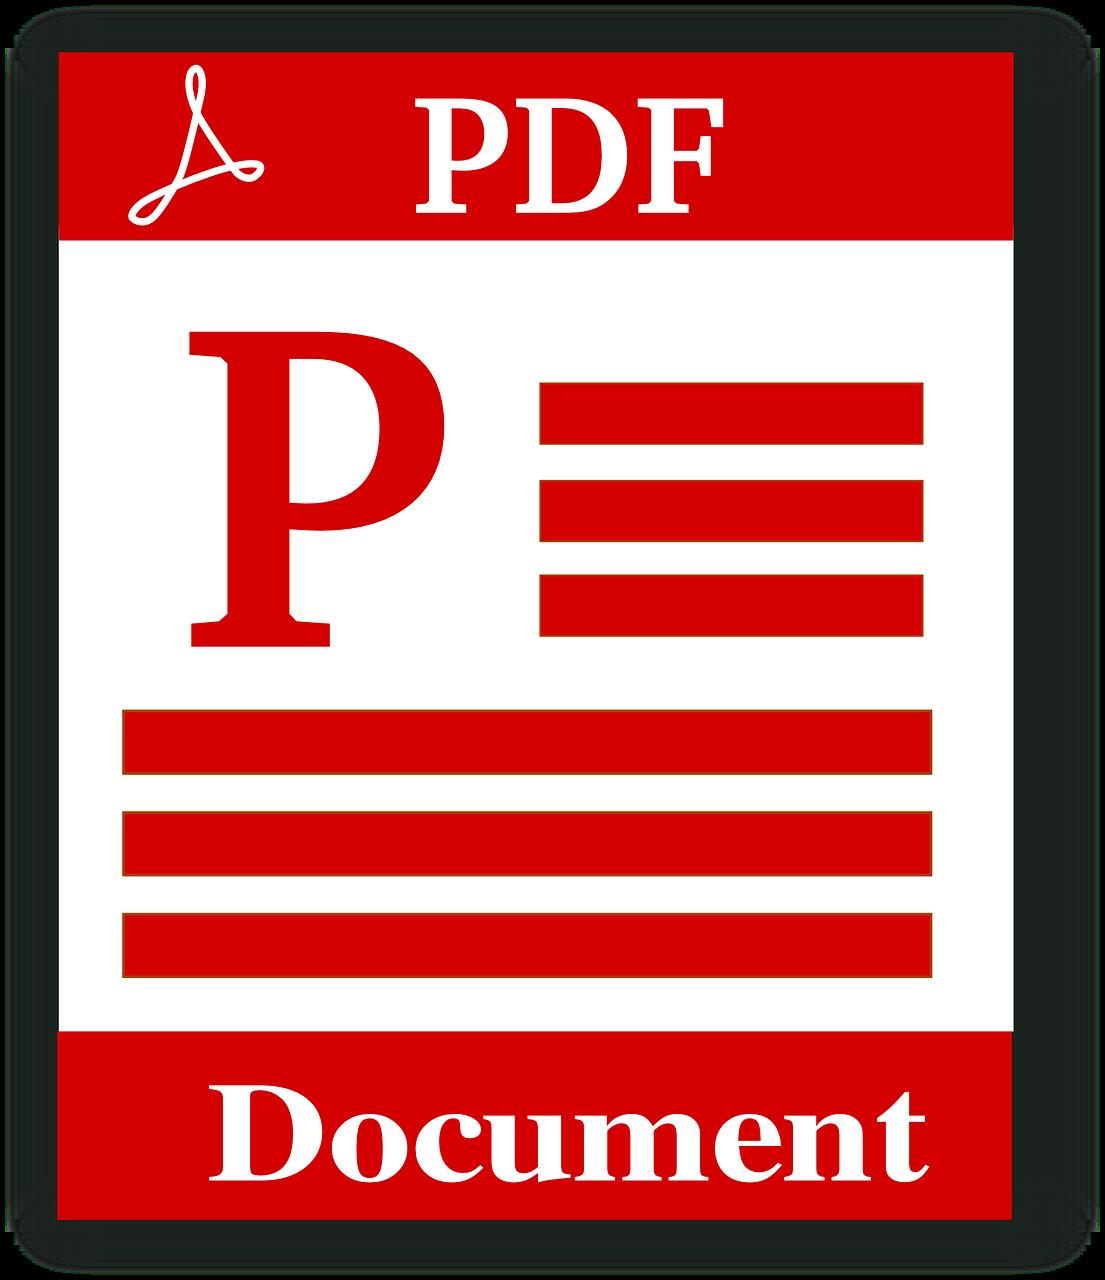 Pdf Documento Ícone - Gráfico vetorial grátis no Pixabay